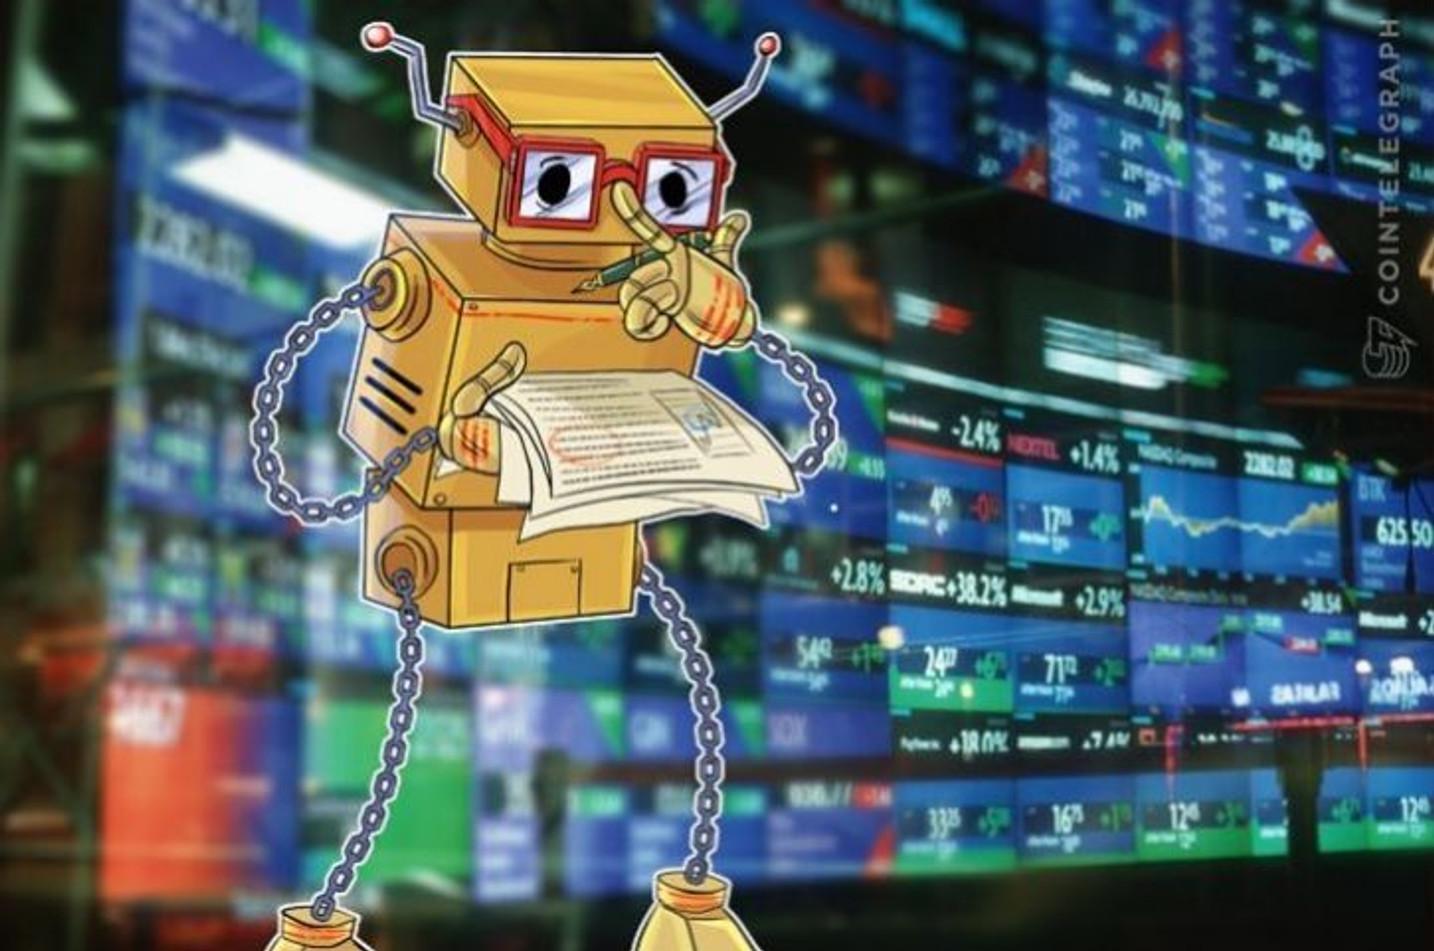 Xerox Applies for Blockchain Timestamp Patent